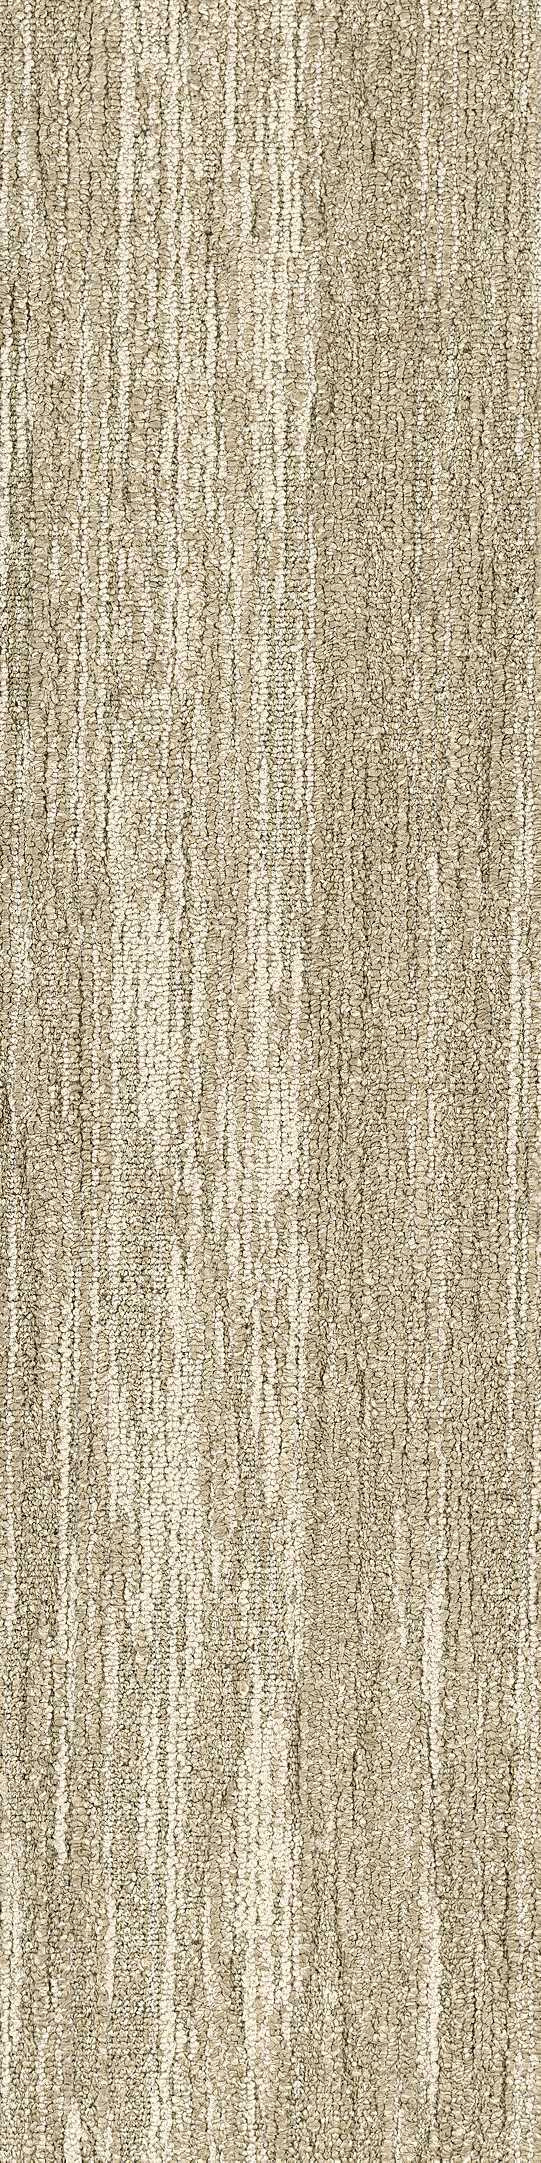 Shaw Resurface Carpet Tile Sandstone